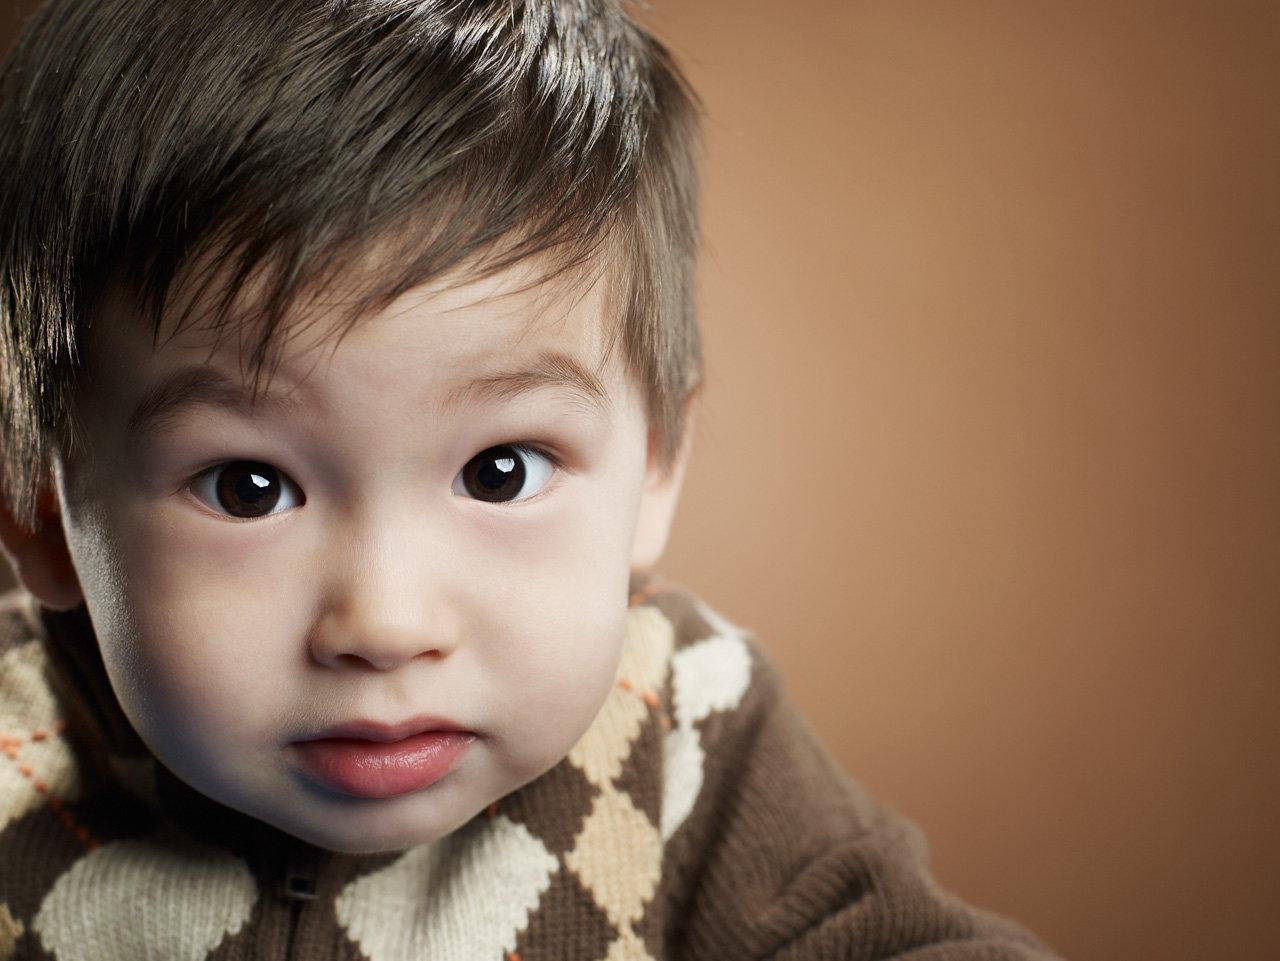 Kid's Haircut - Age 1-5